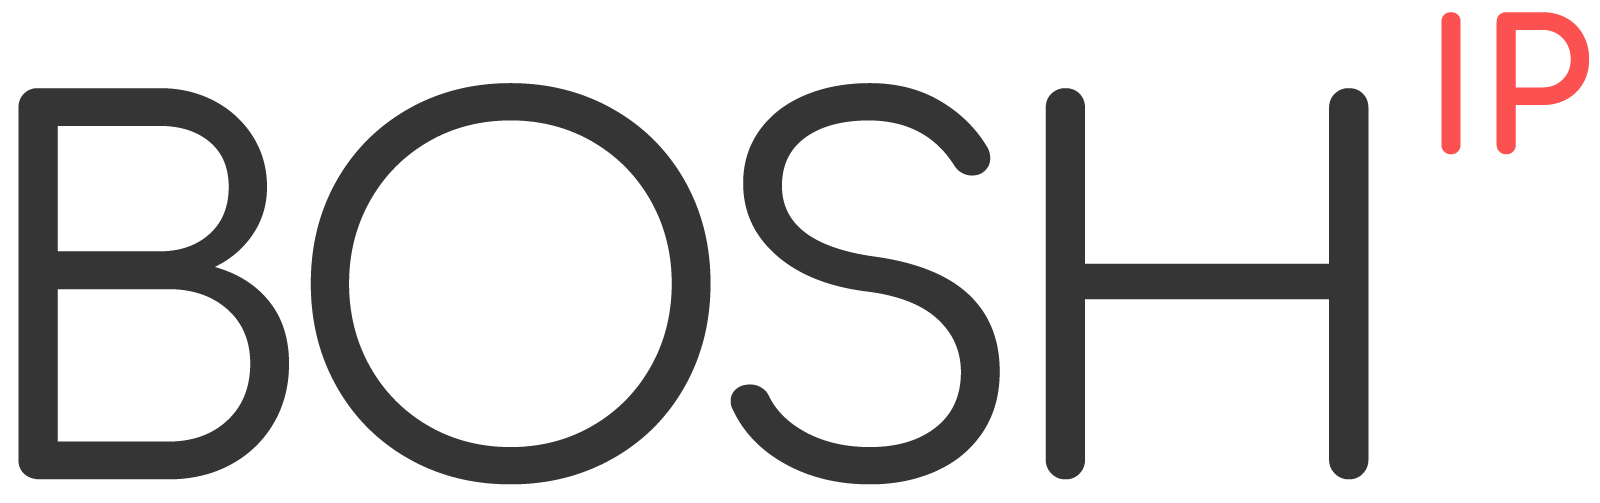 BOSH IP – Patent Attorneys Sydney & Melbourne